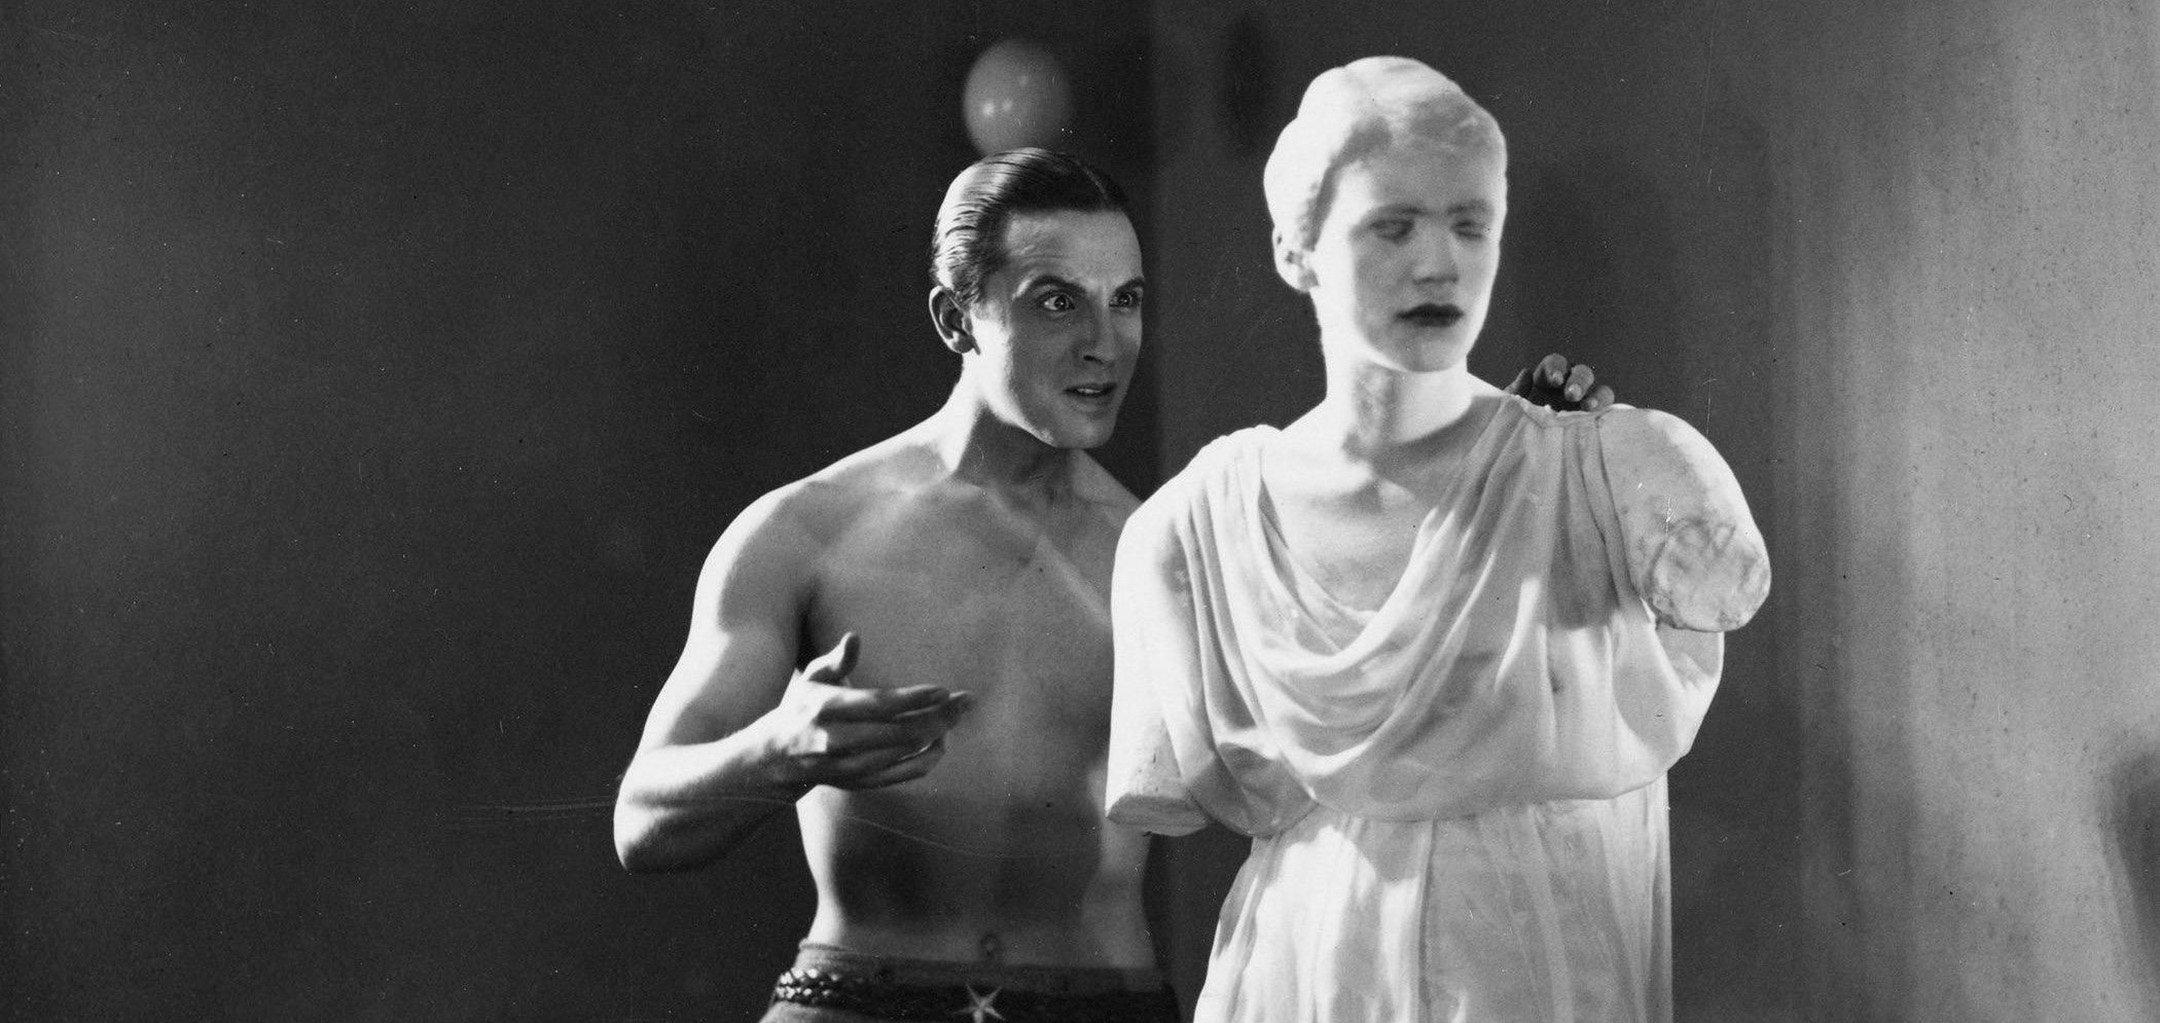 Enrique Rivero talks to a statue in a still from 'Le Sang D'un Poète' (1932)